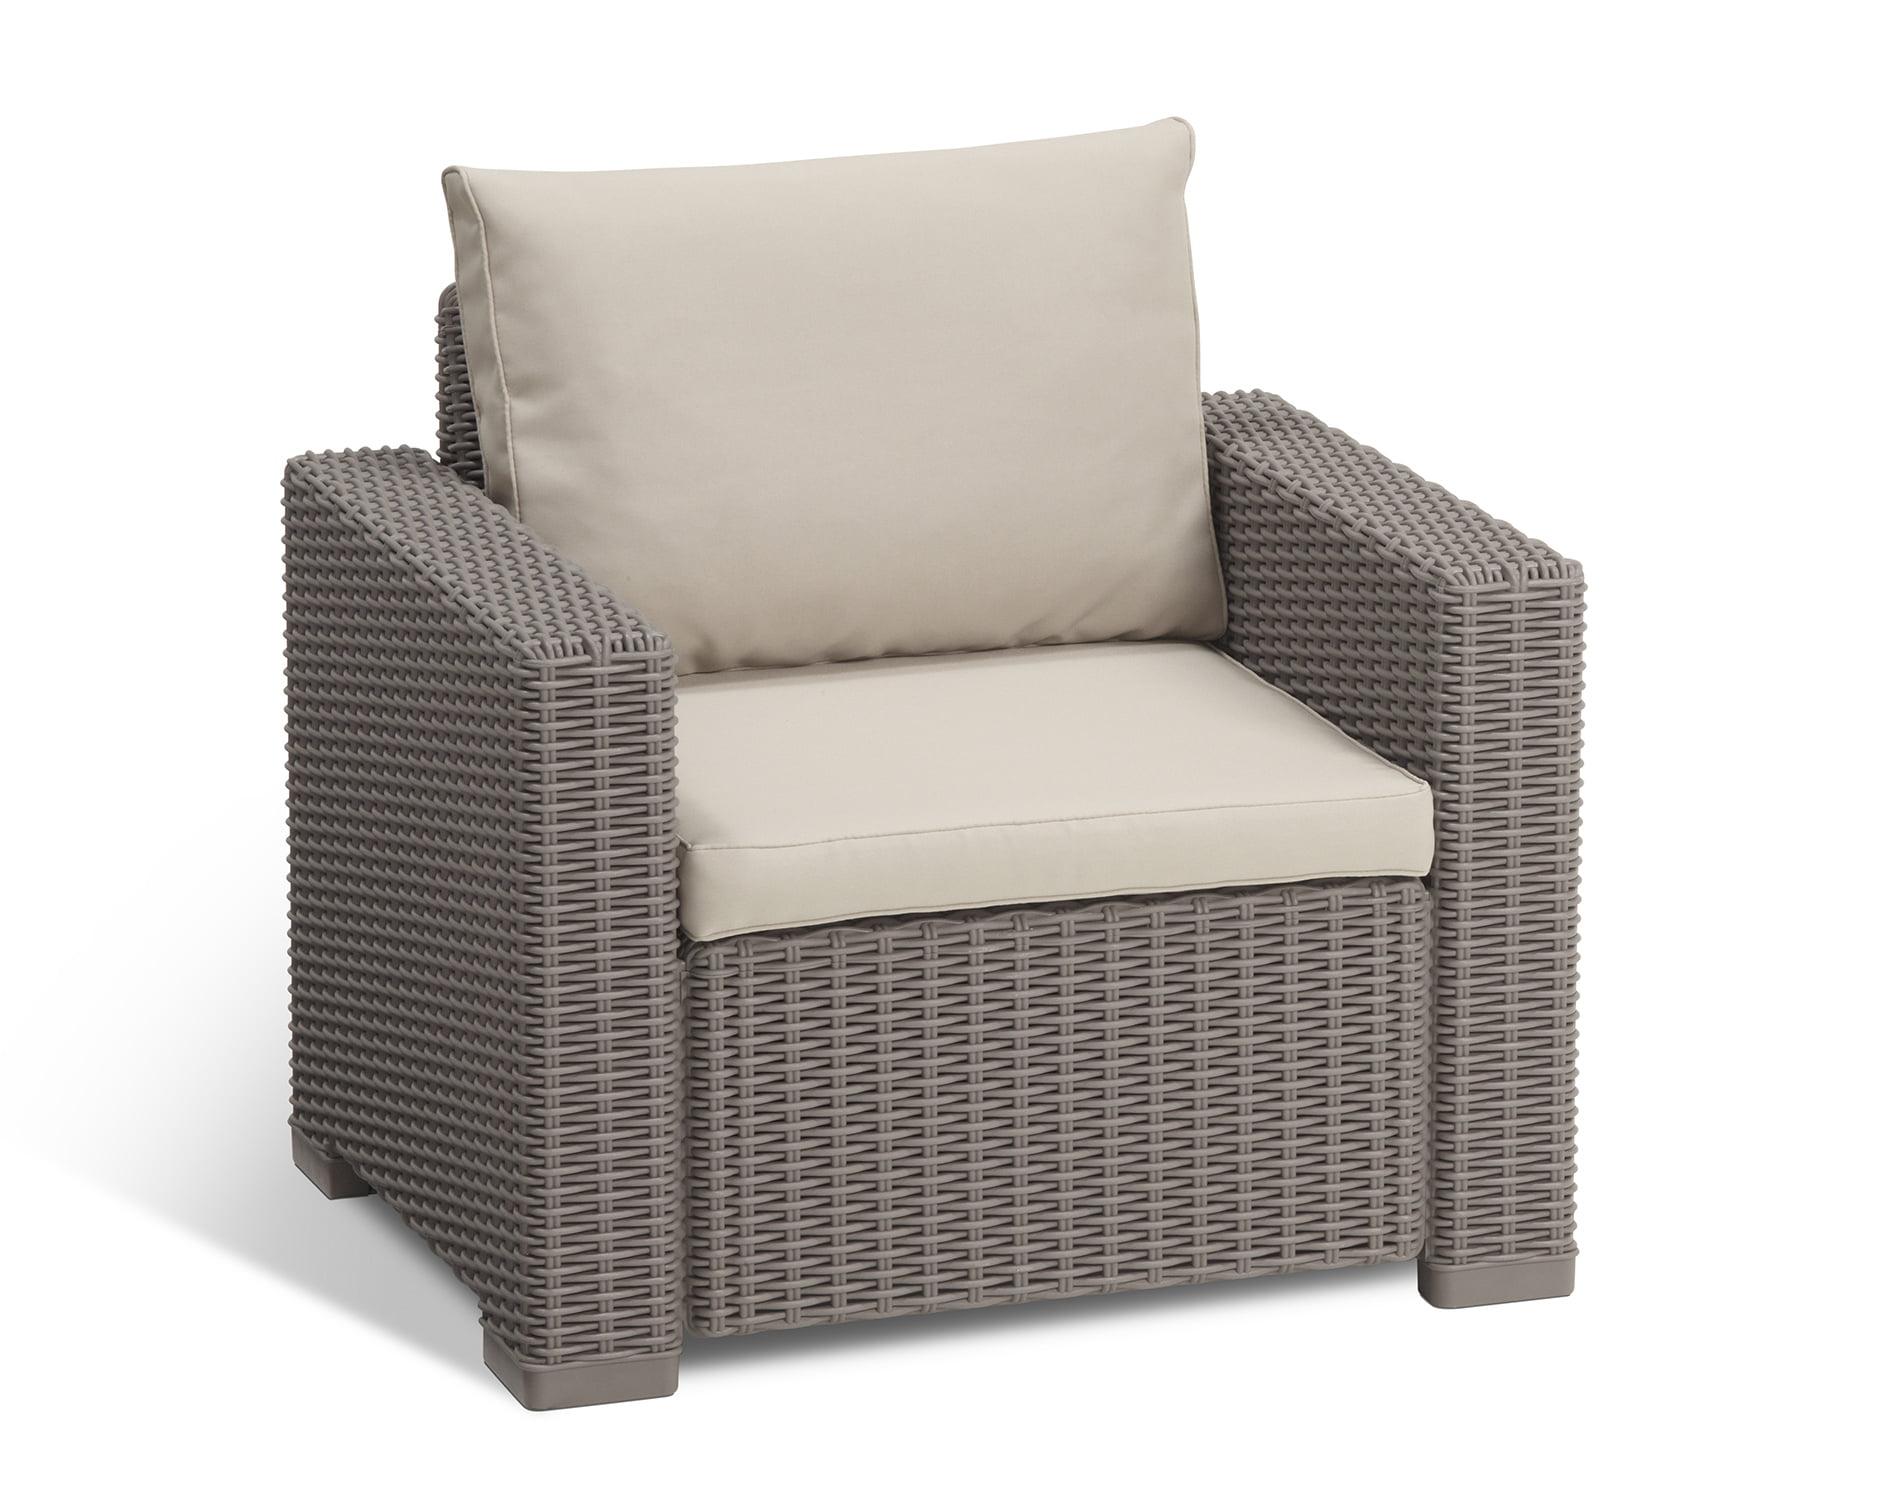 California Backyard Patio Furniture.Keter California Outdoor Seating Patio Chair In Plastic Resin Rattan Wicker With Cushions Cappuccino